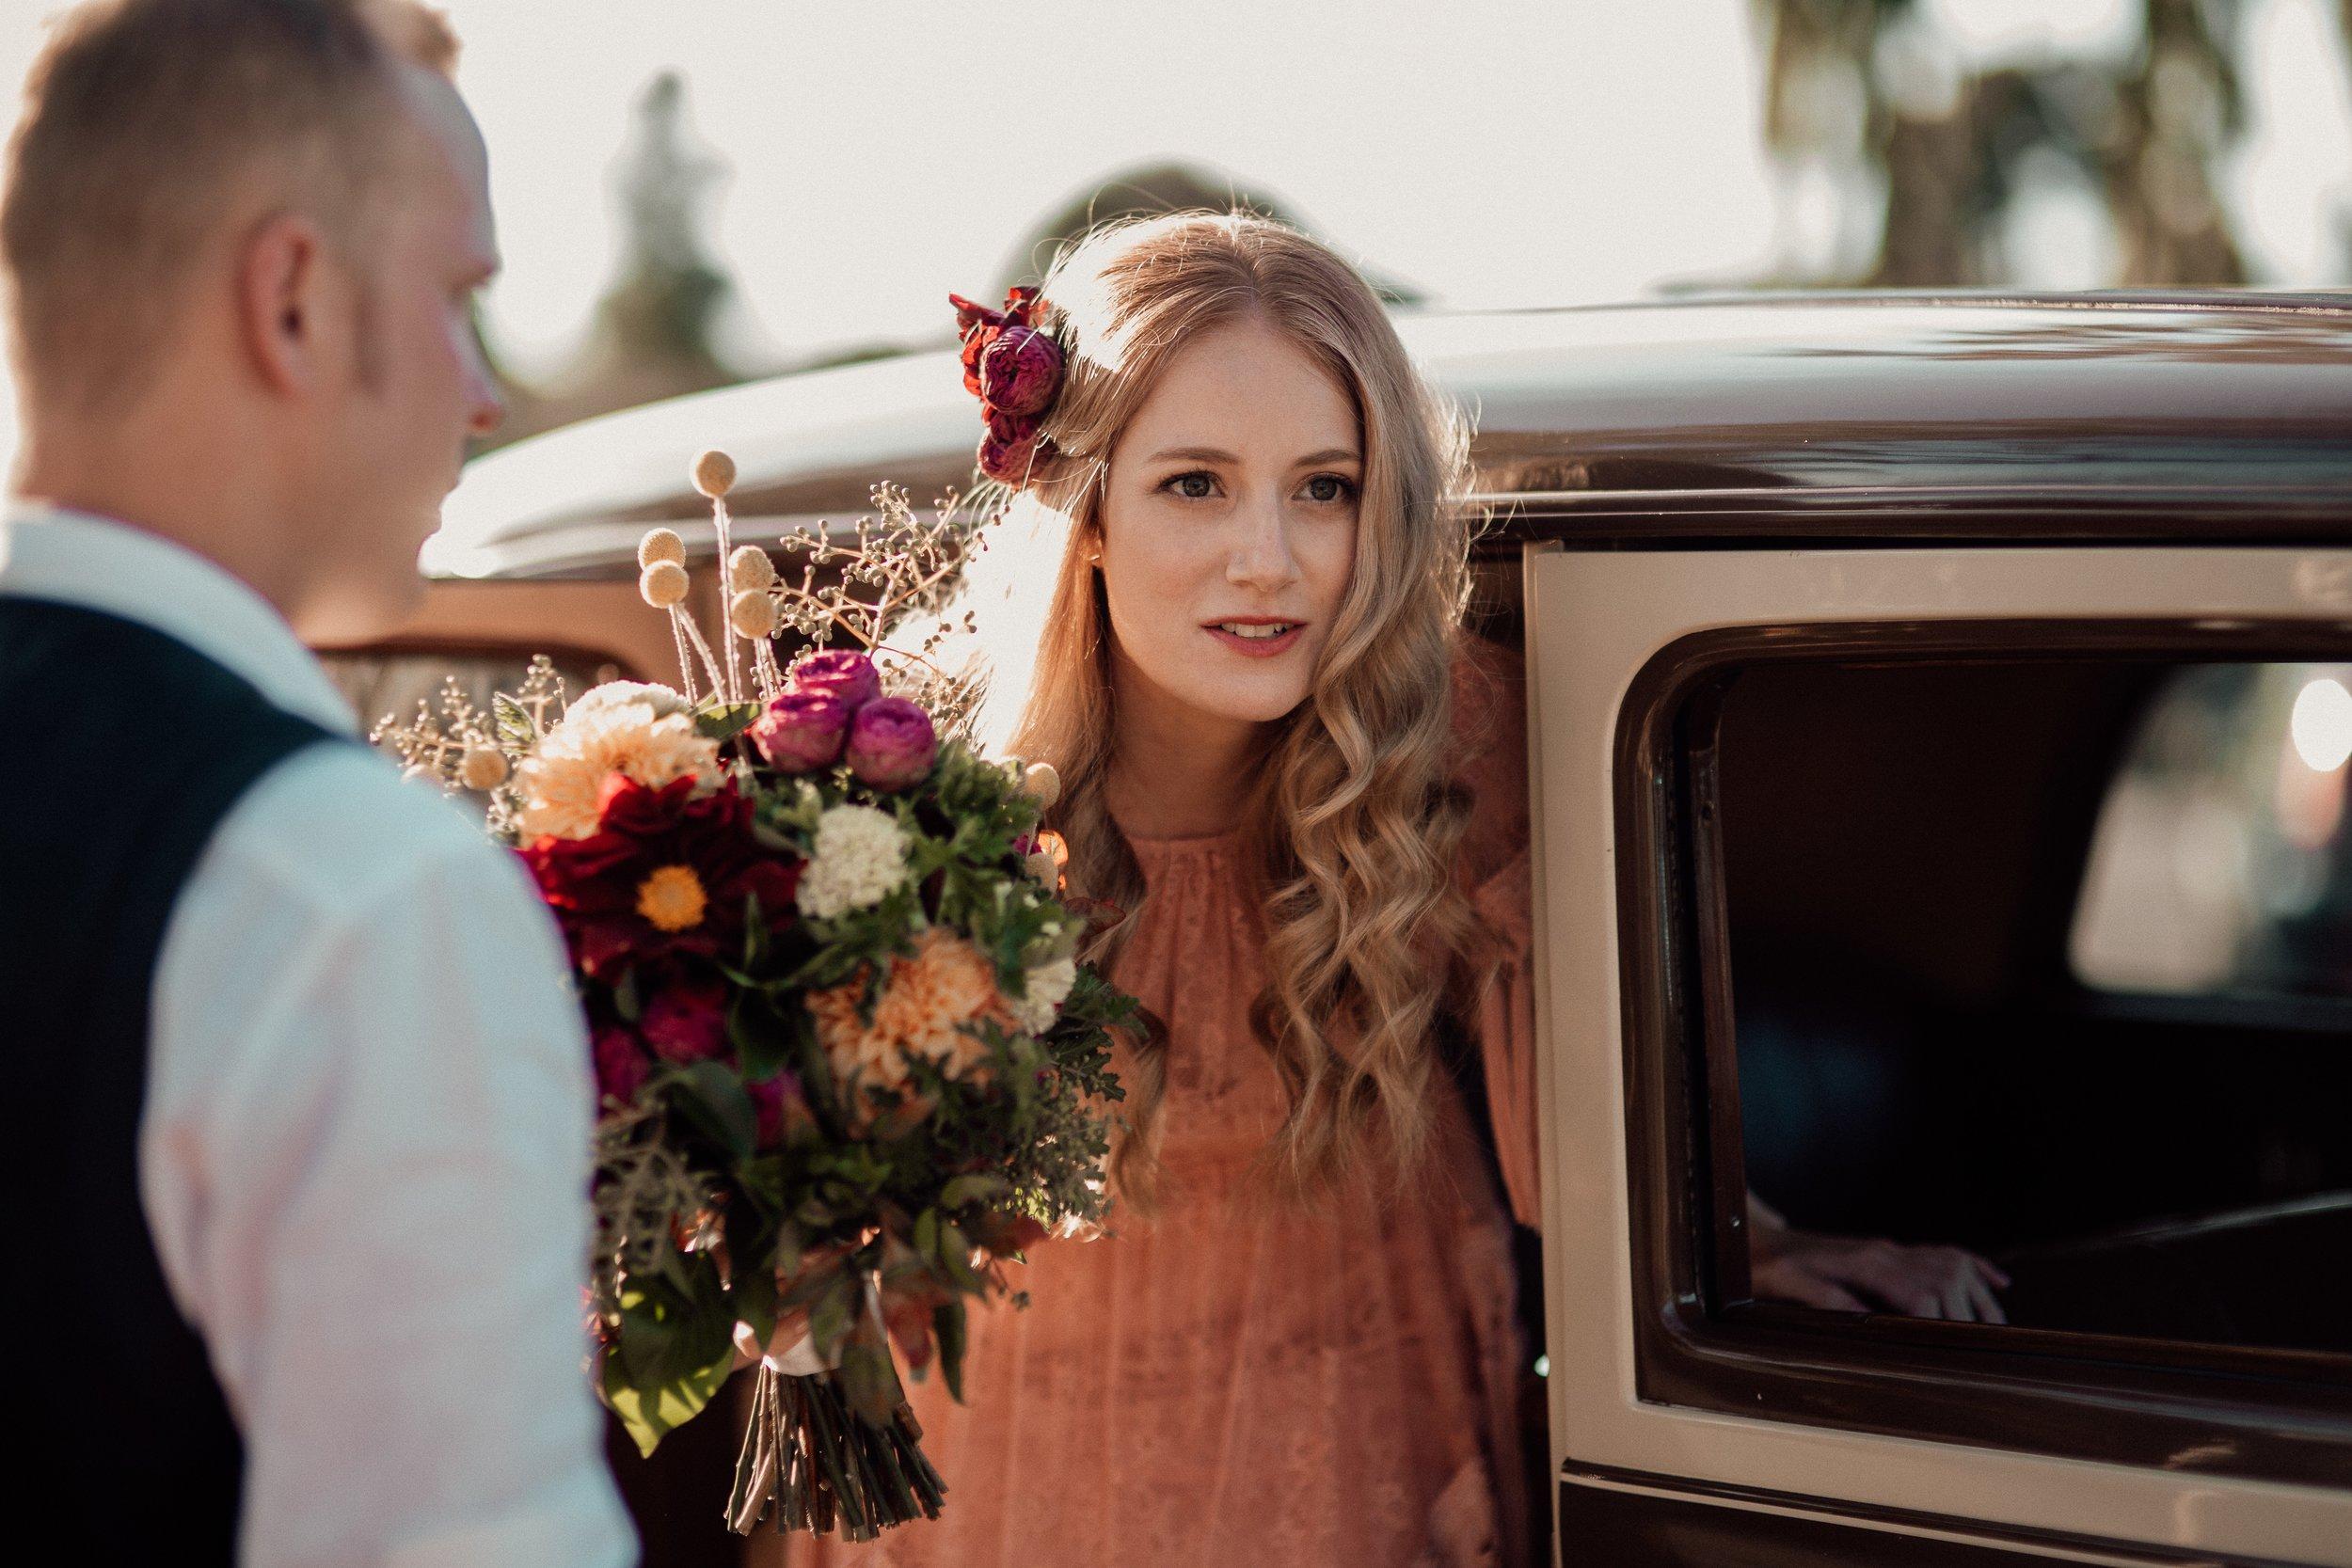 mickalathomas_puremacphotography_weddingphotographer_couplephotographer_Sheppartonphotographer_2129.jpg